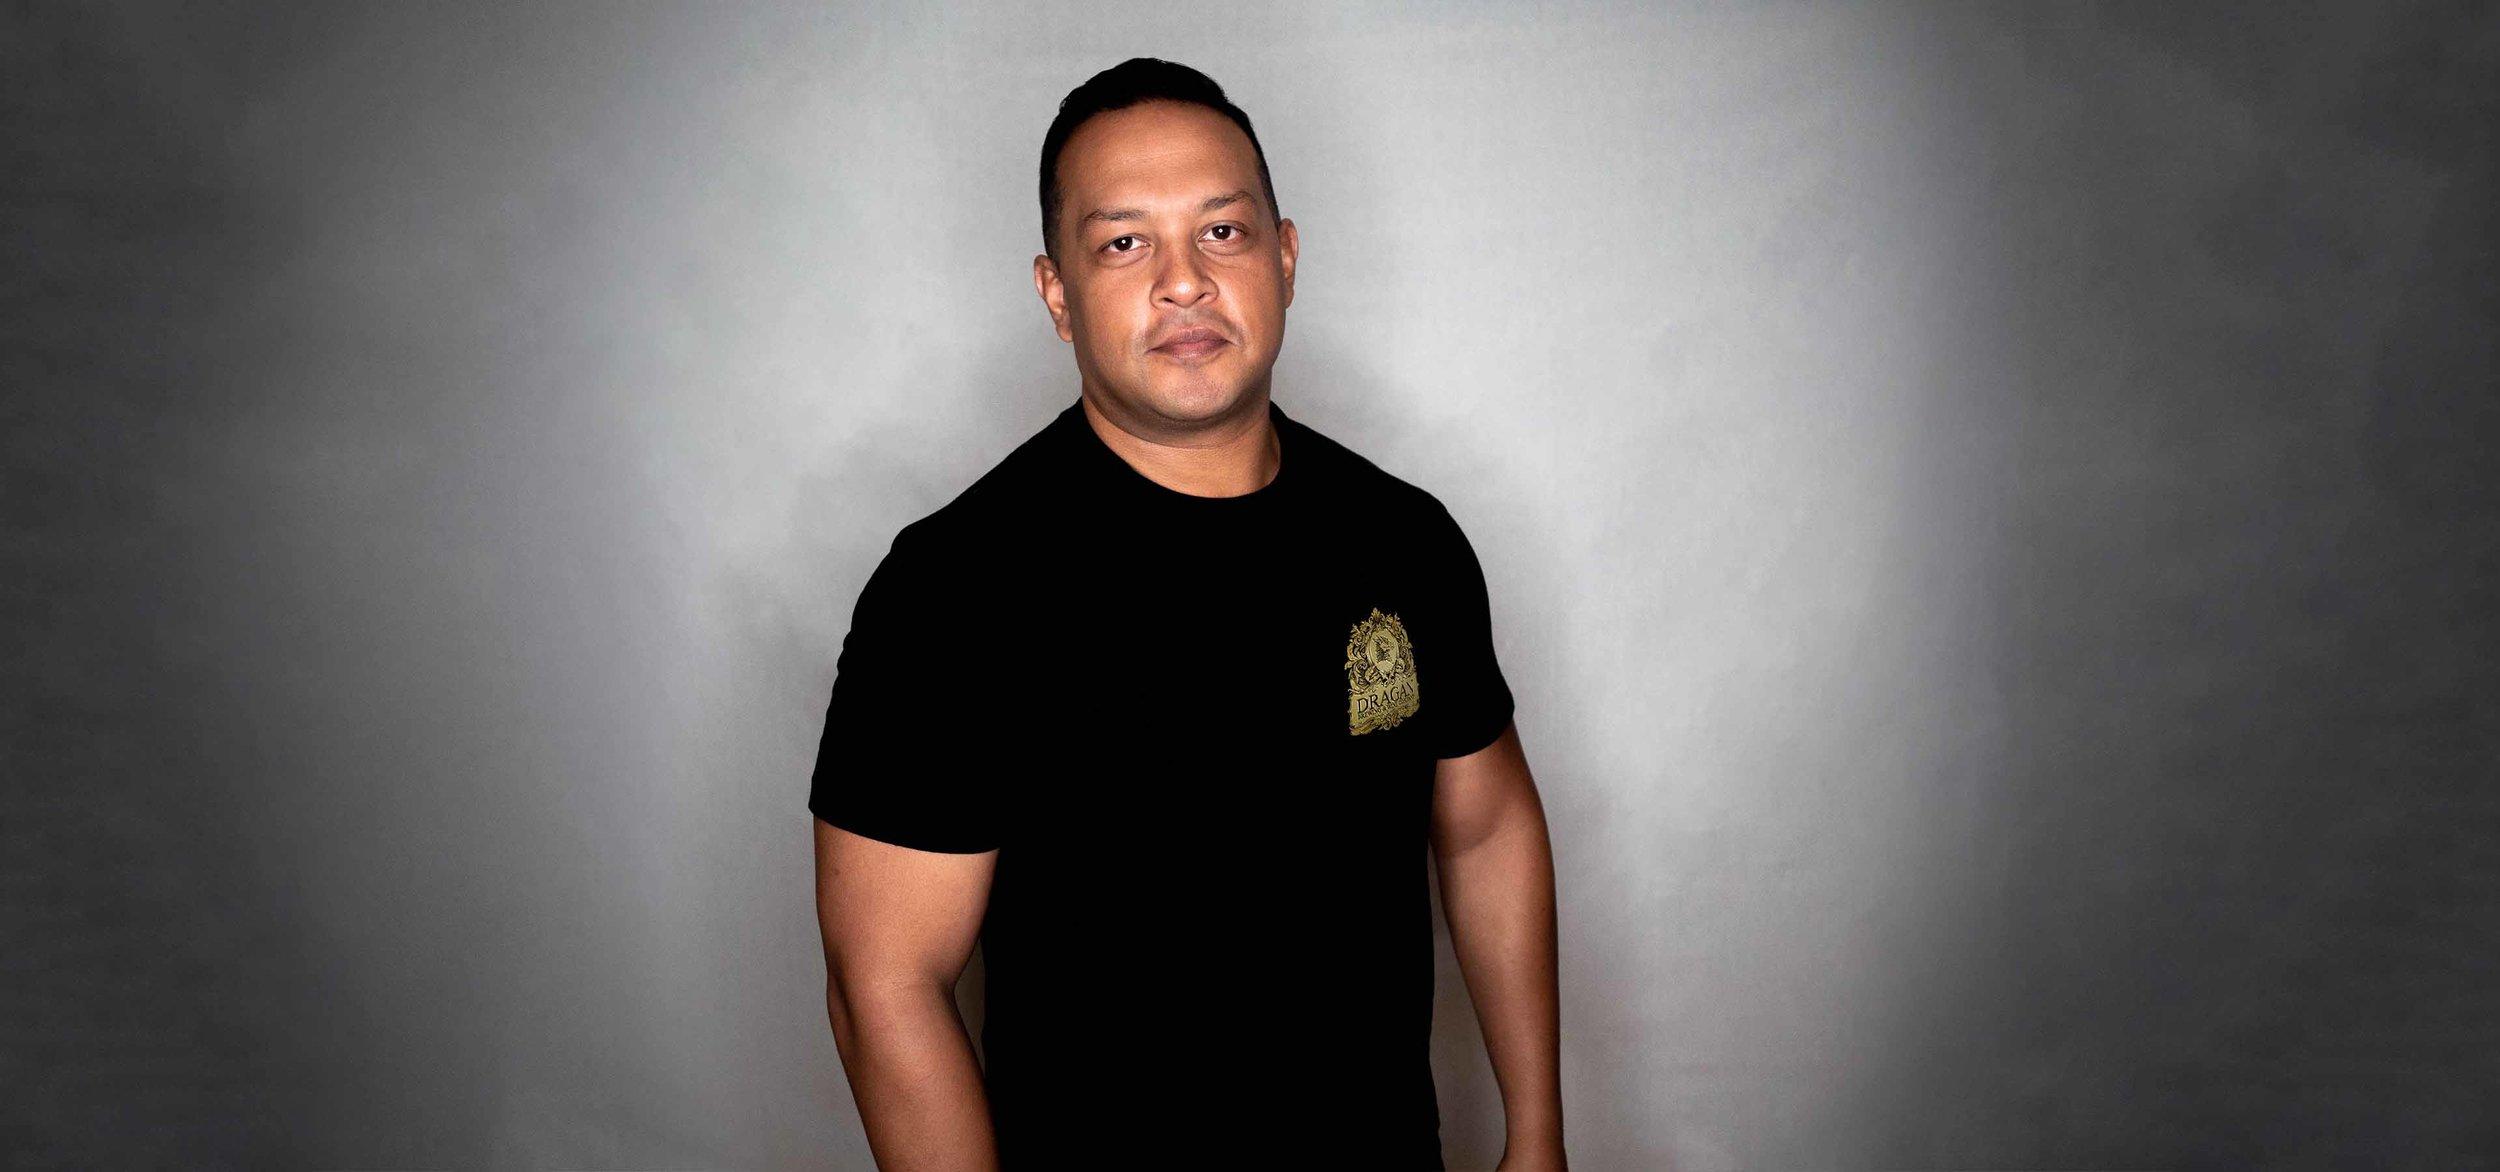 michael_nazareth_portrait